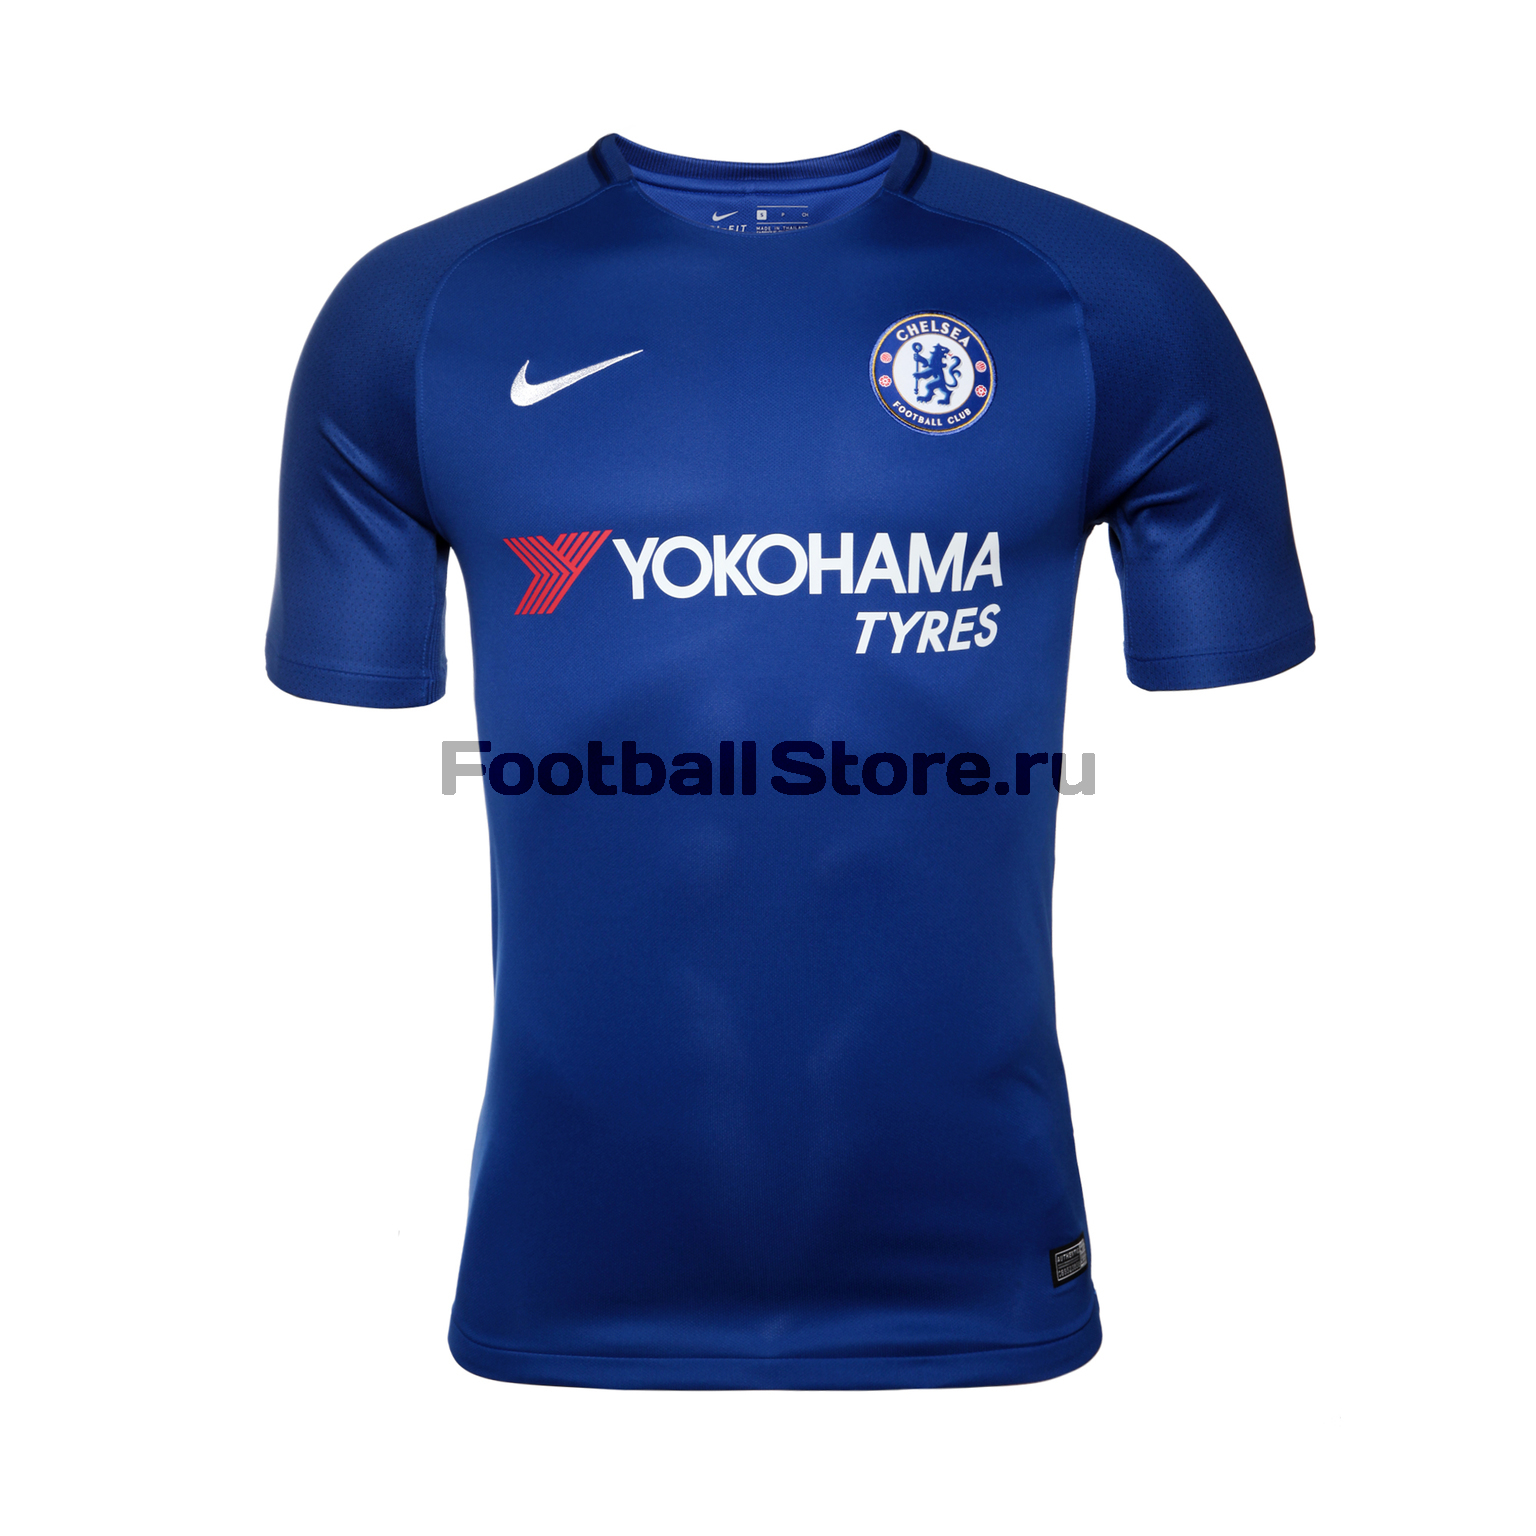 Chelsea Nike Футболка игровая Nike Chelsea Stadium 905513-496 игровая форма nike футболка детская nike ss precision iii jsy boys 645918 410